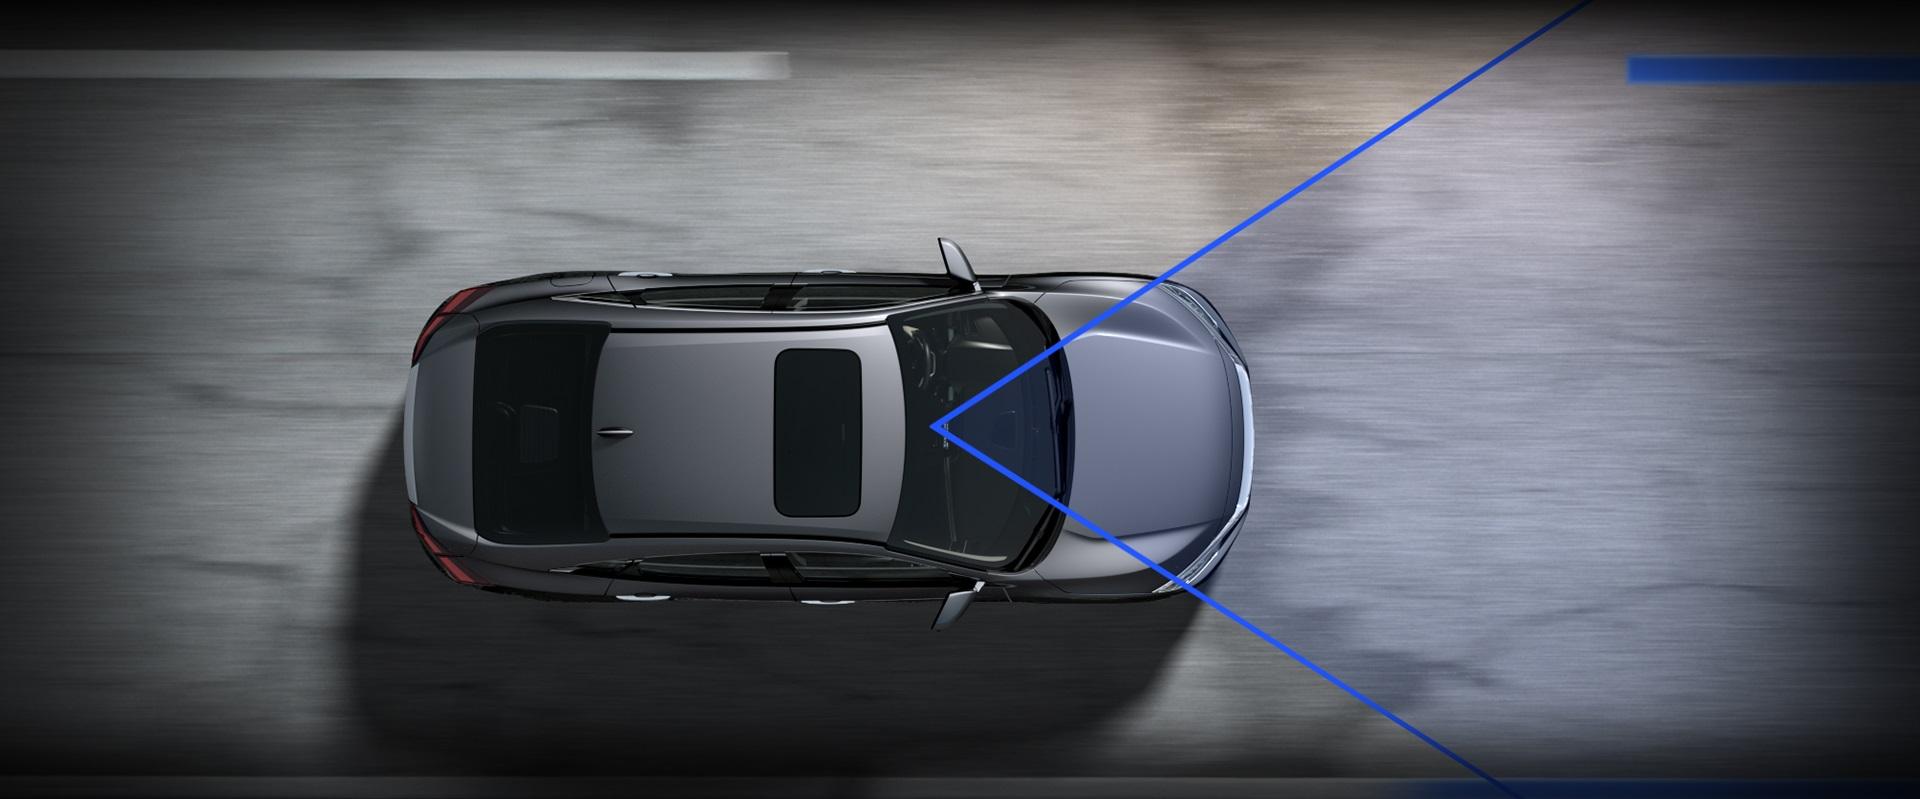 2016 Honda Civic Lane Keeping Assist System